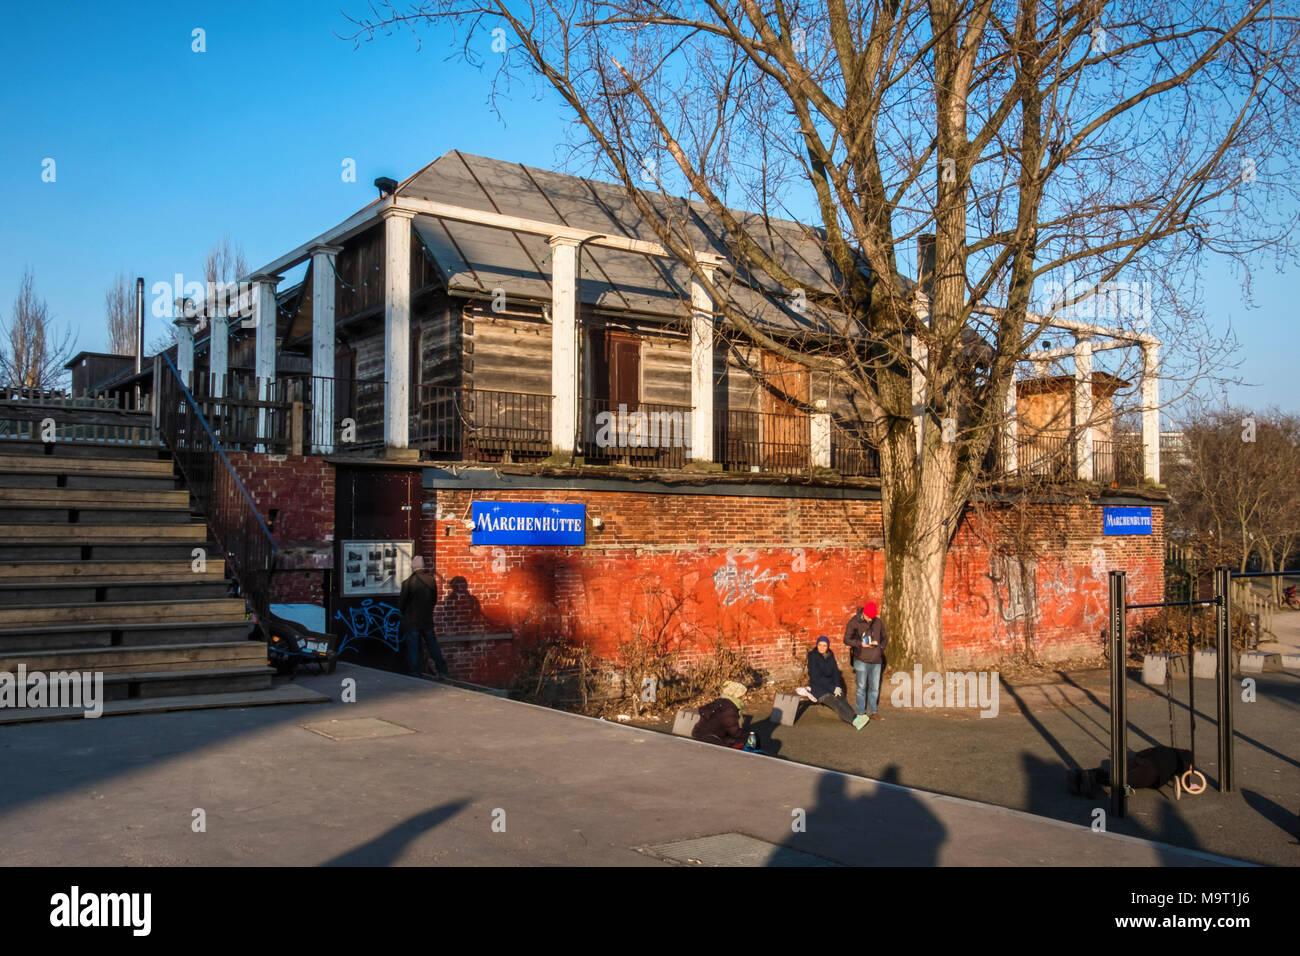 Berlin, Mitte.Märchenhütte Fairy tale theatre. Wooden hut theater.Venue for Grimms fairy Tale productions - Stock Image